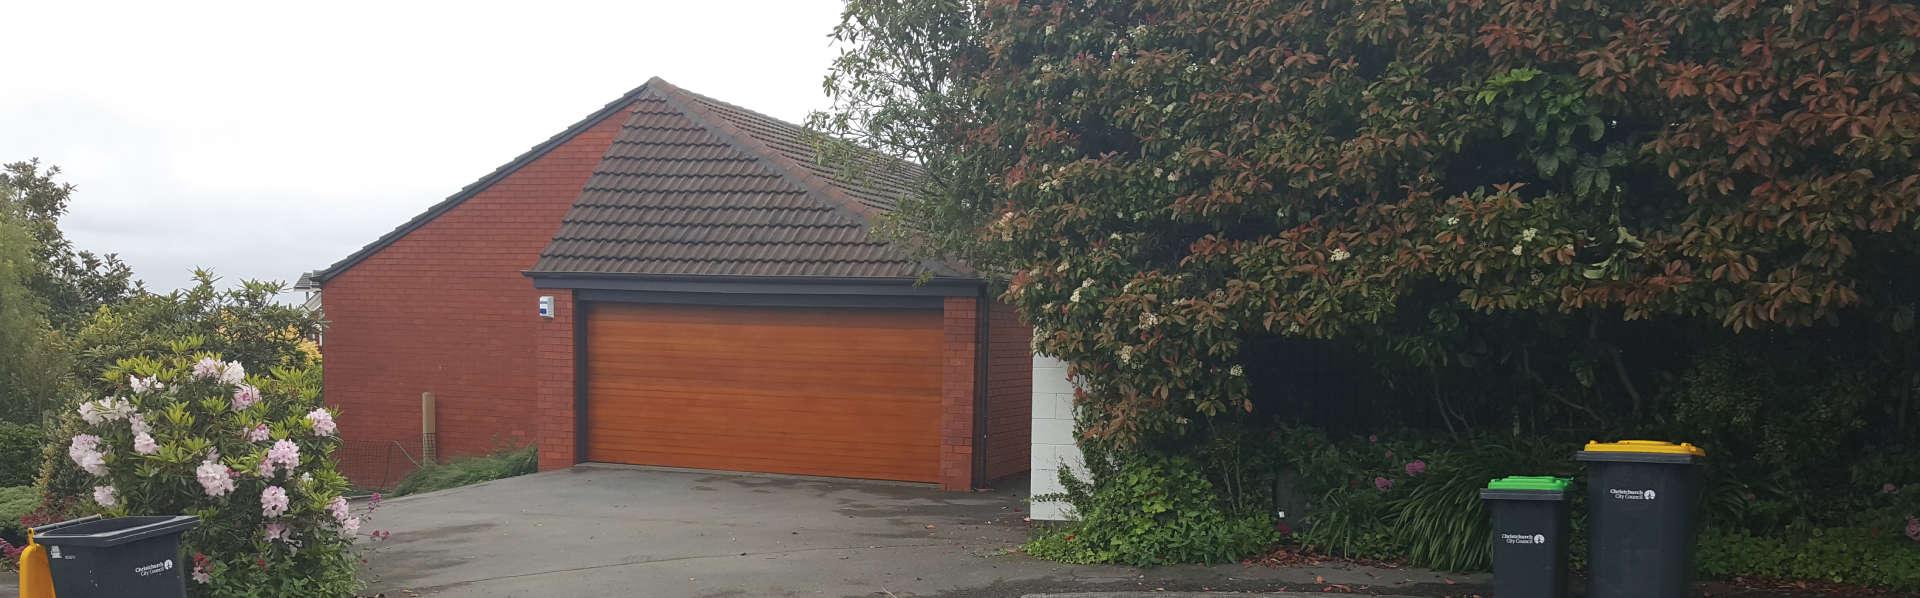 garage-door-man-christchurch